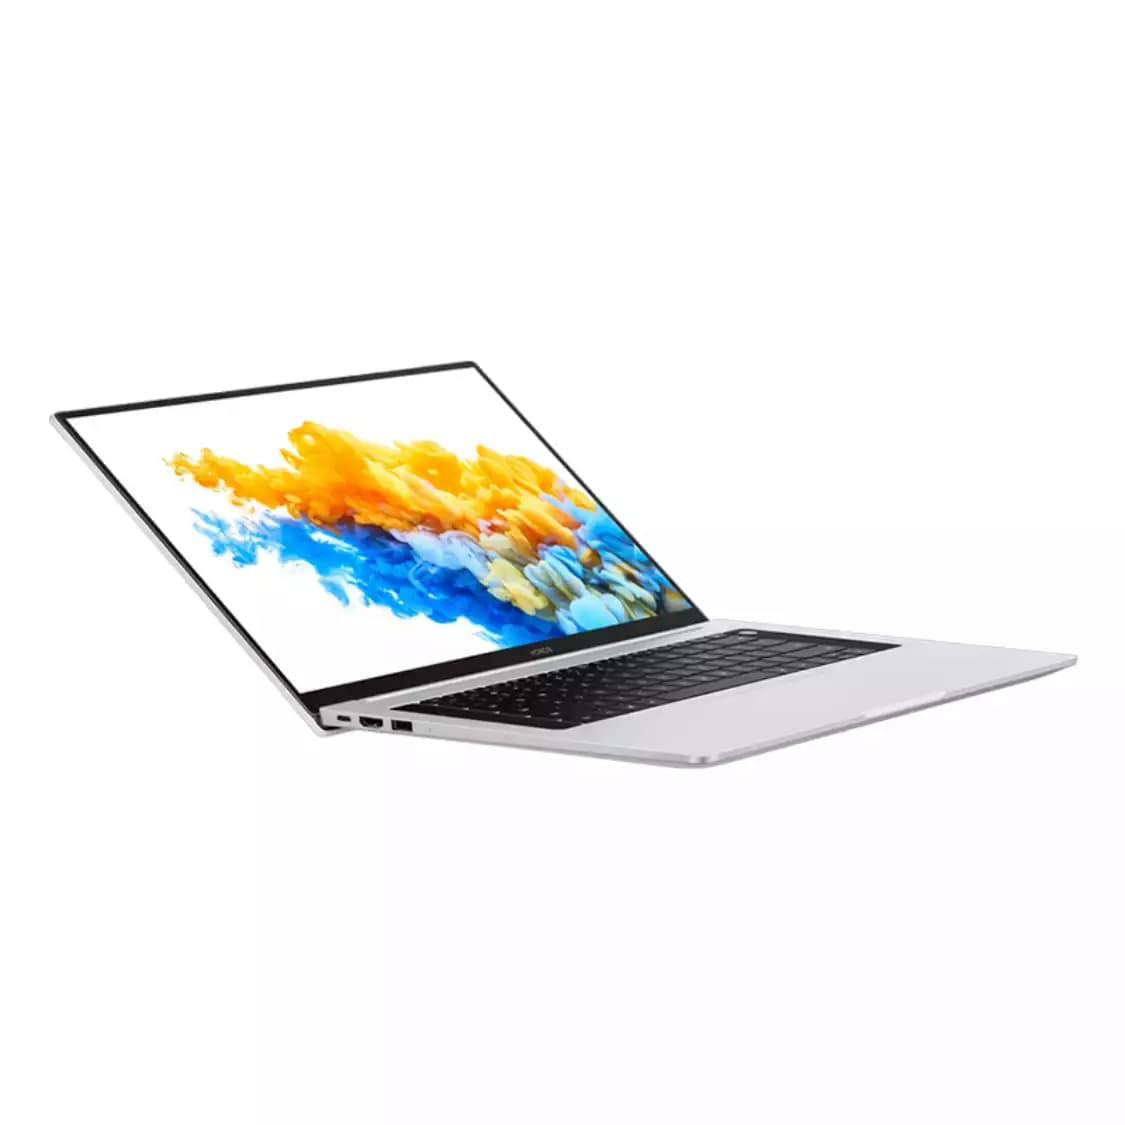 Honor MagicBook Pro 2020 rendering